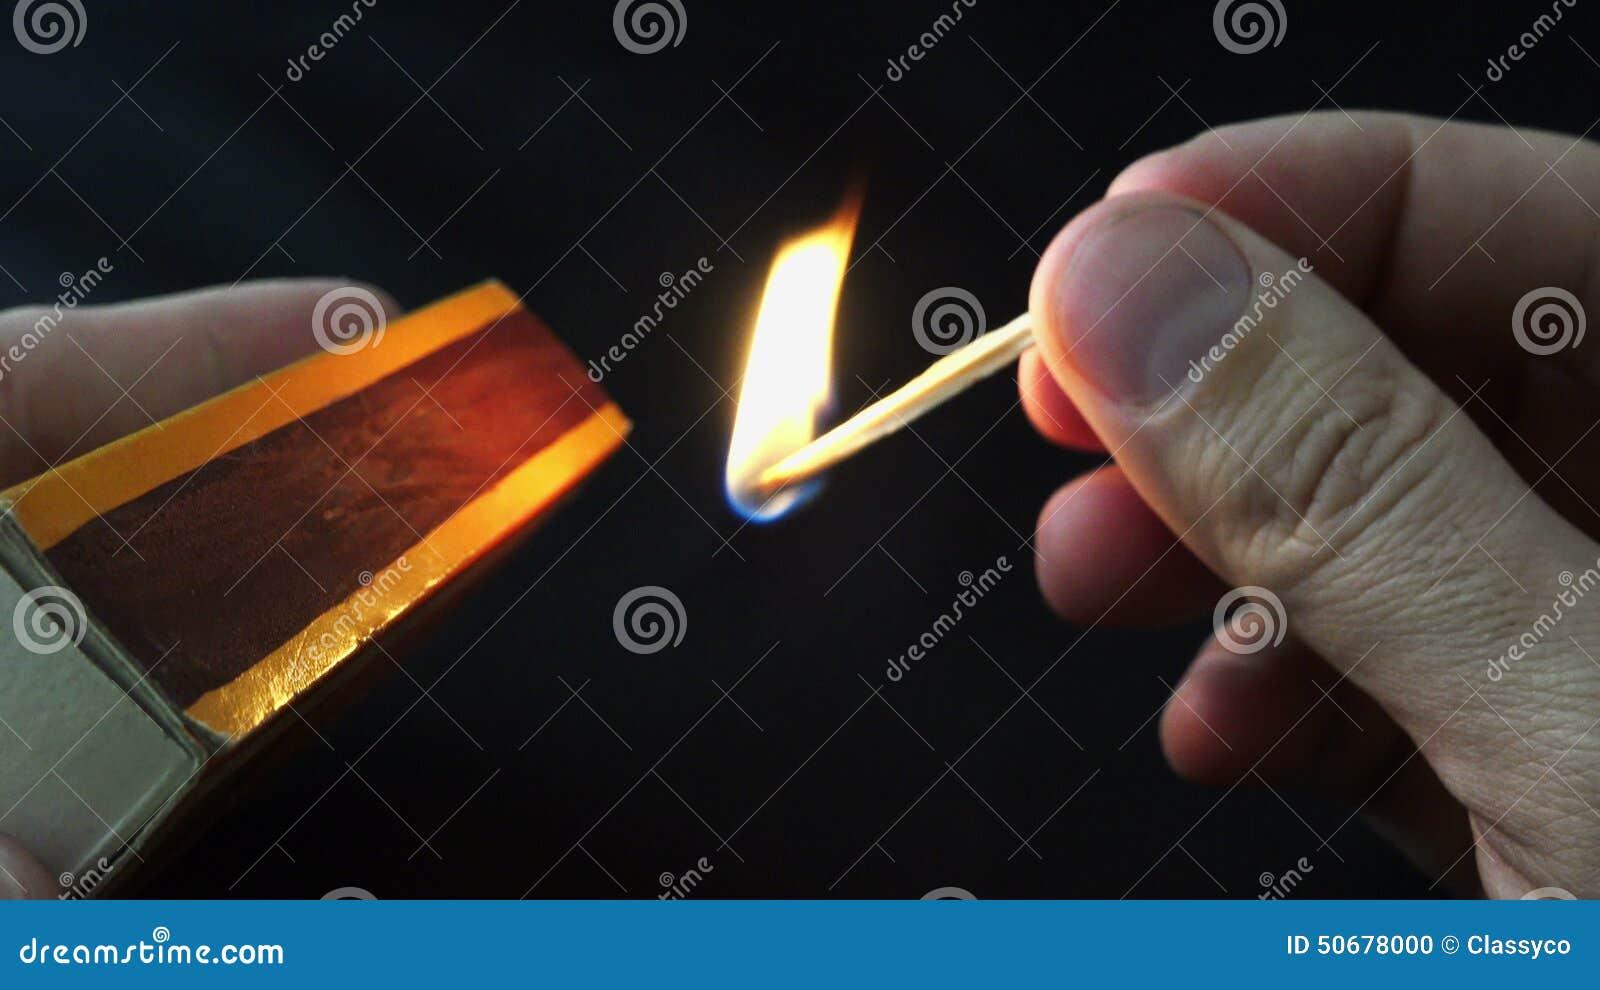 Lighting a match stick 4K stock video footage & Hand lighting a match stock video. Image of blaze flame - 96627973 azcodes.com